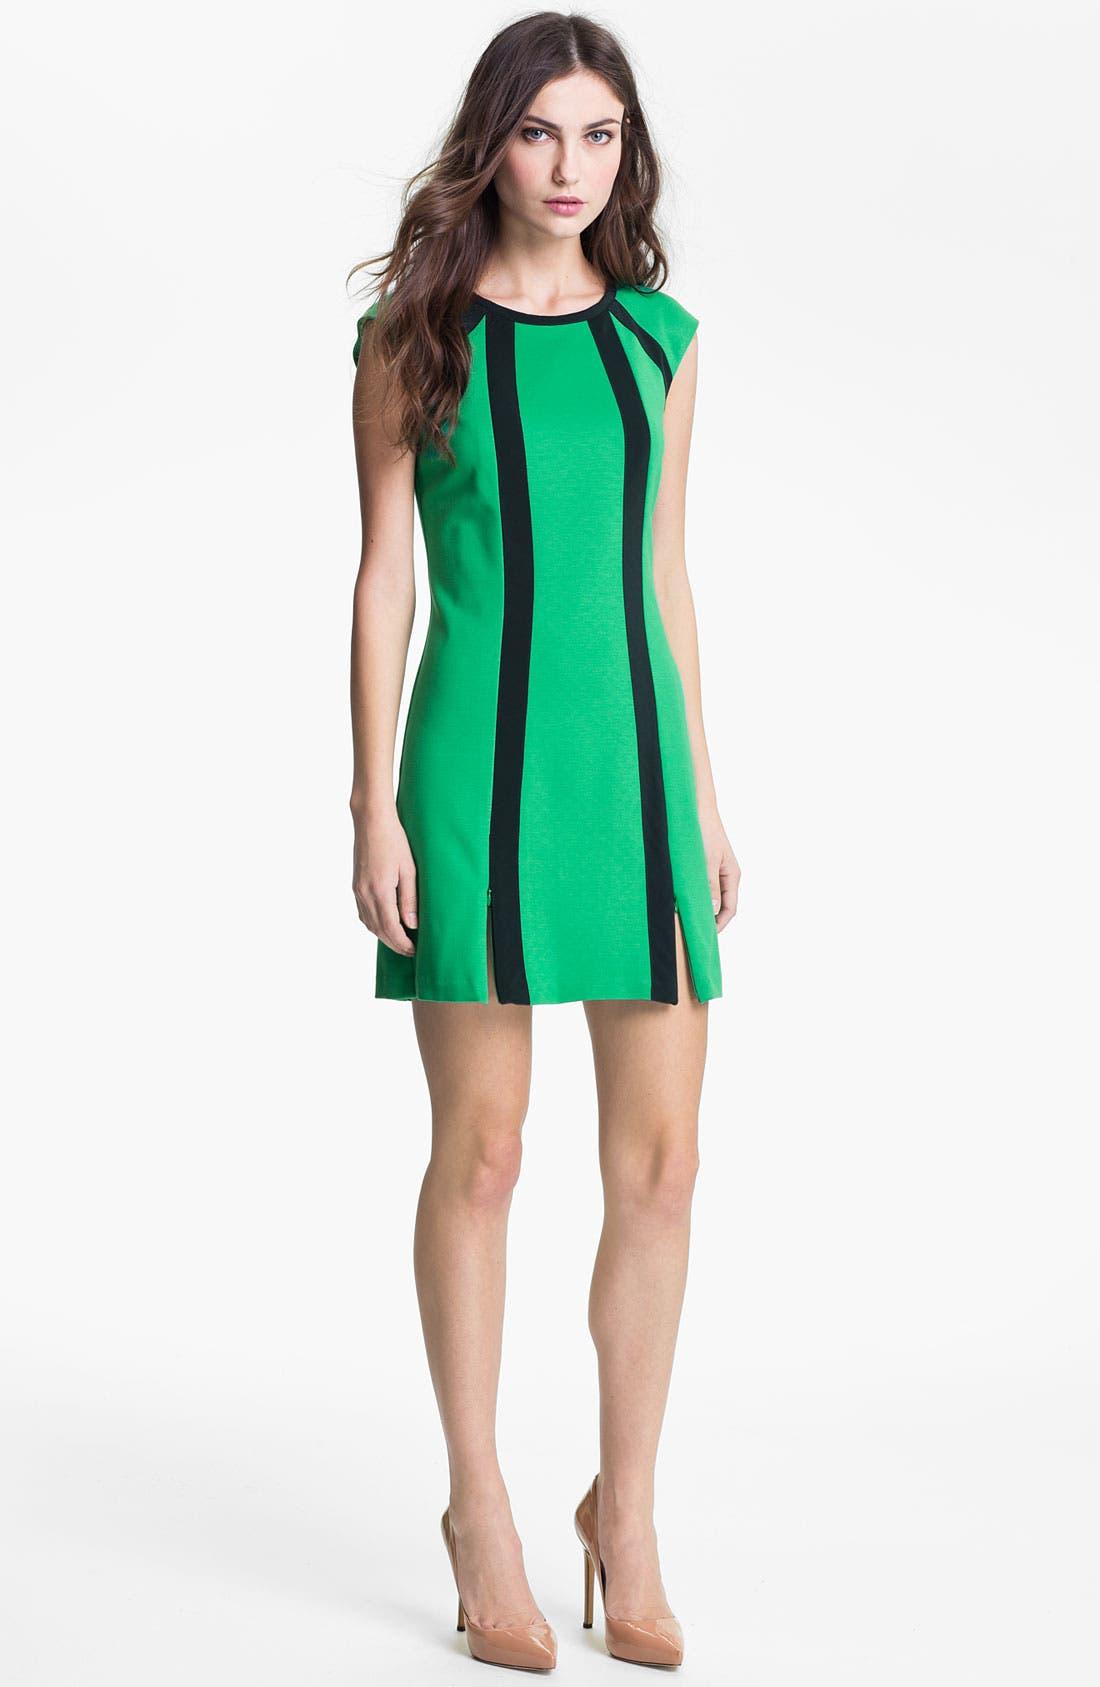 Alternate Image 1 Selected - Nanette Lepore 'Underground' A-Line Minidress